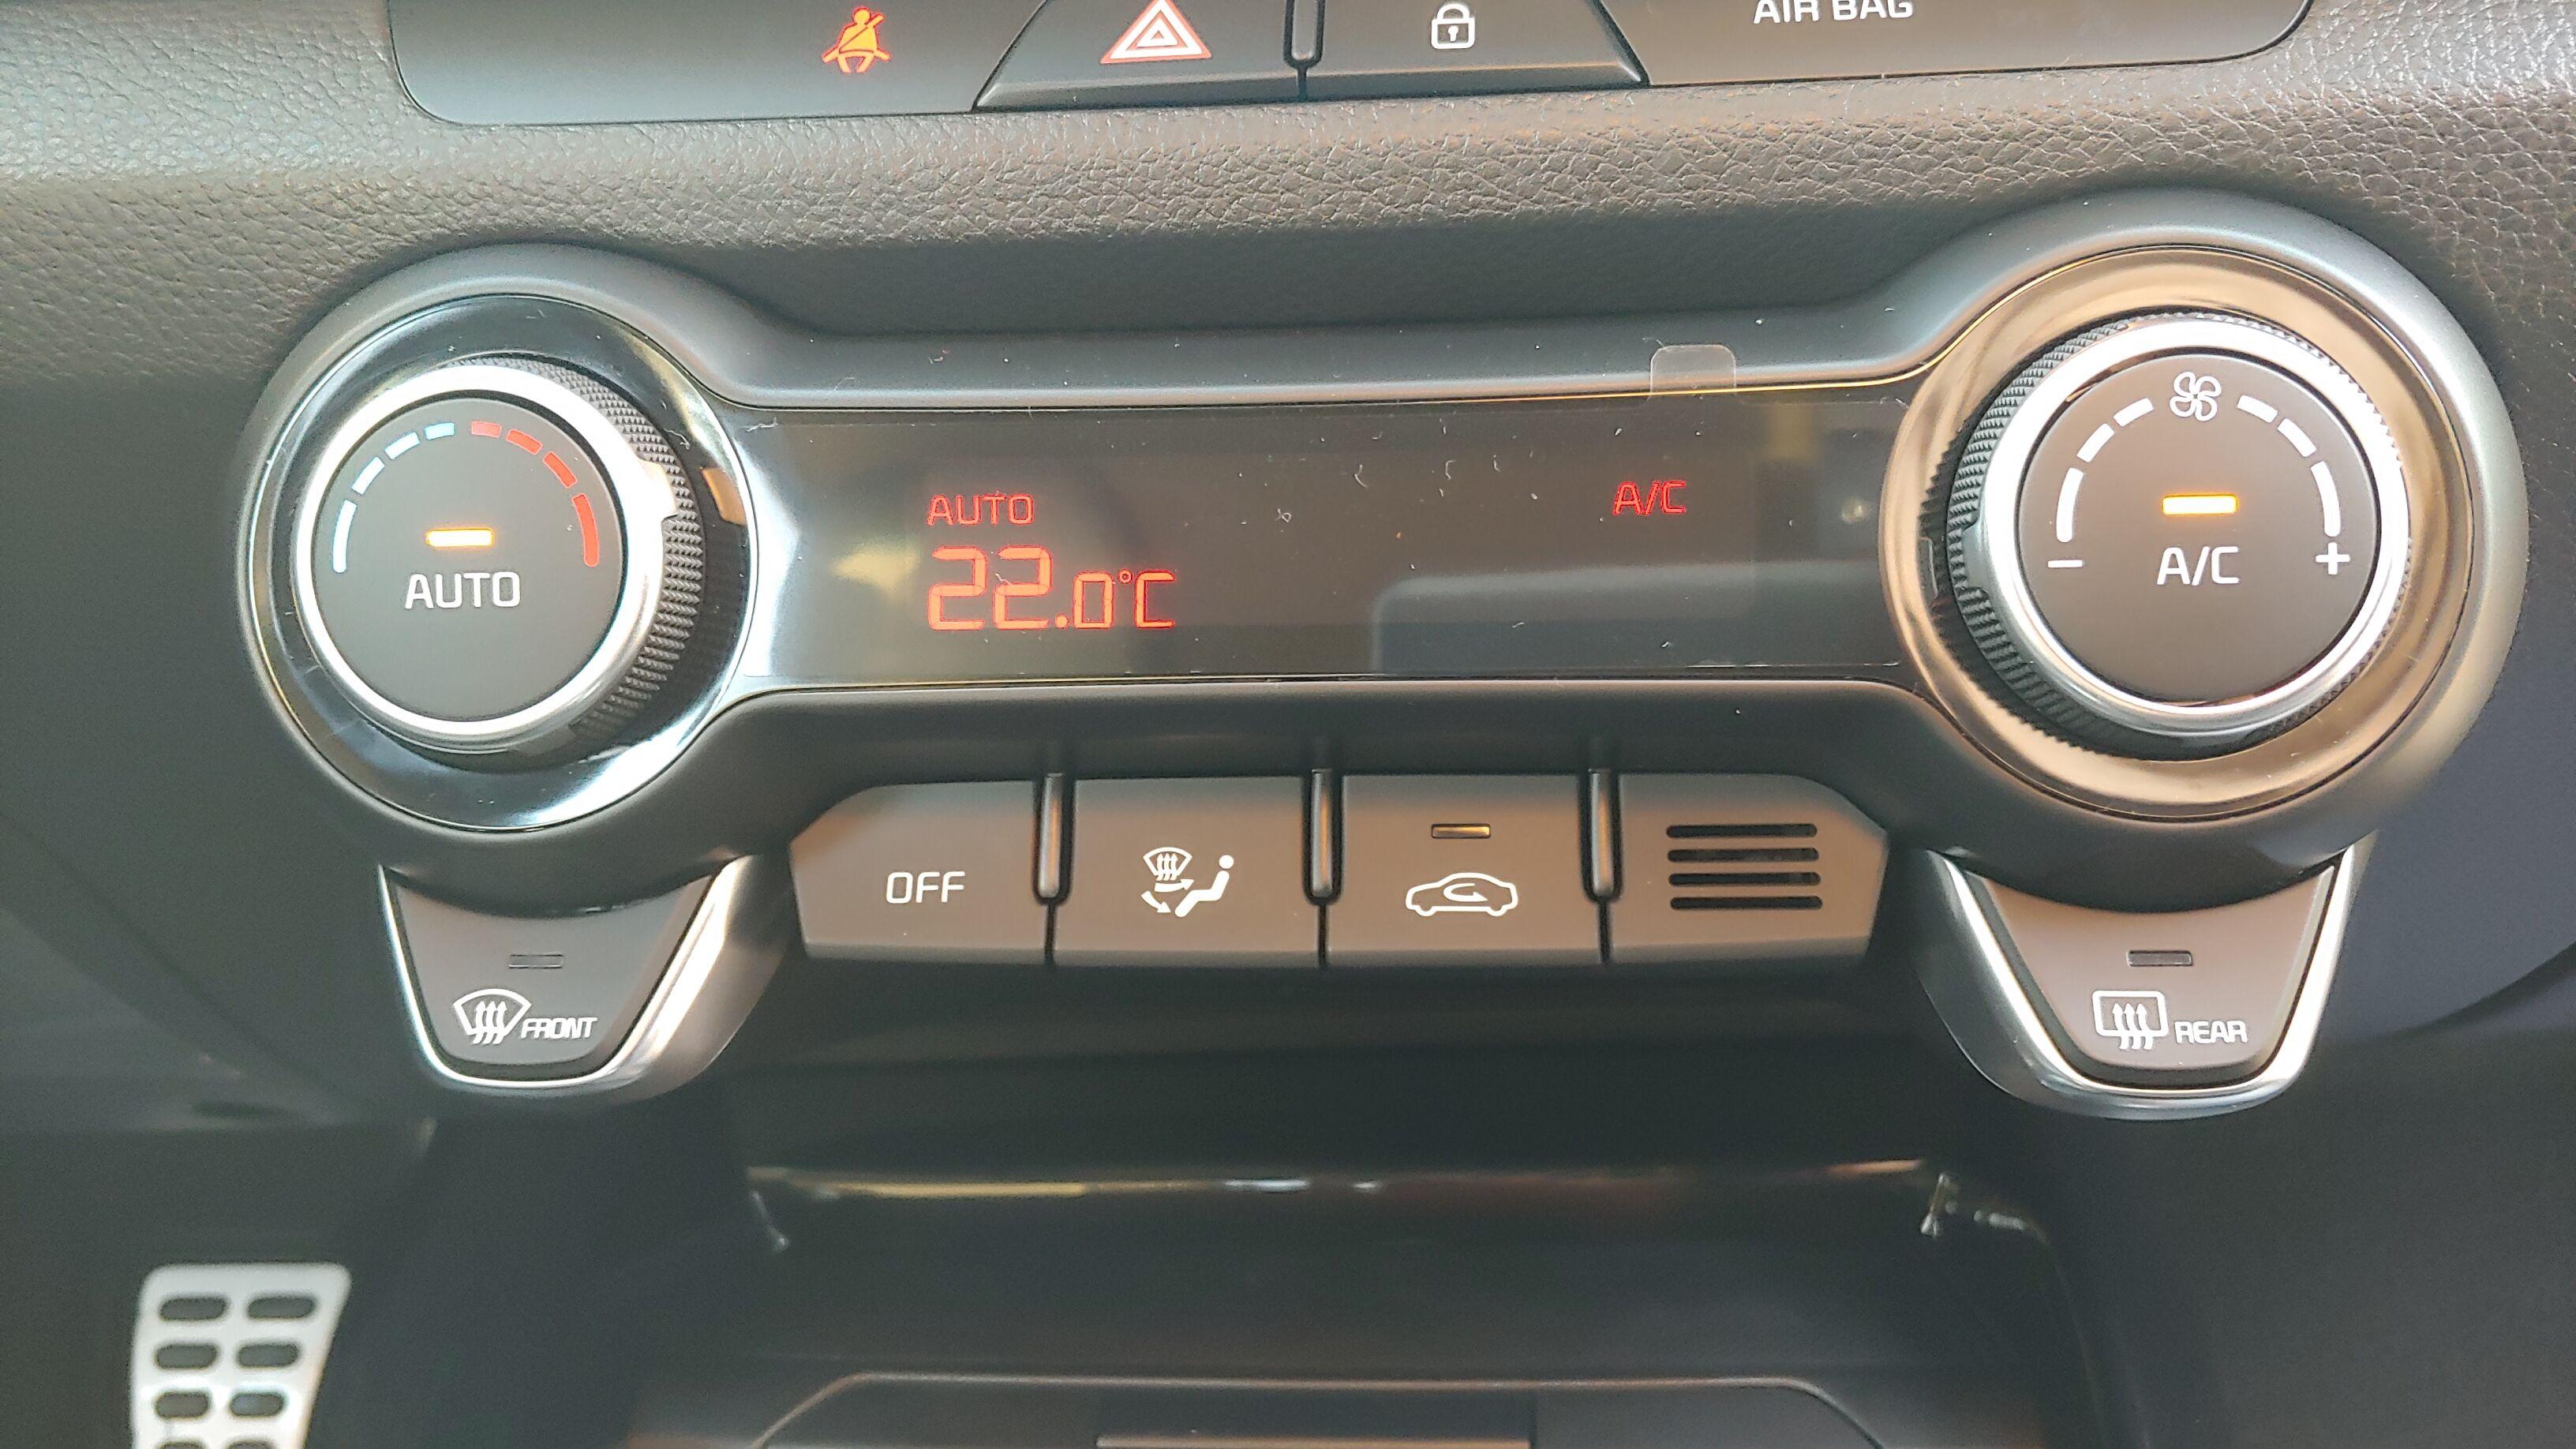 Kia Stonic 1.0 T Sense ISG / Leder /GPS / Camera | 7 jaar garantie 8/13